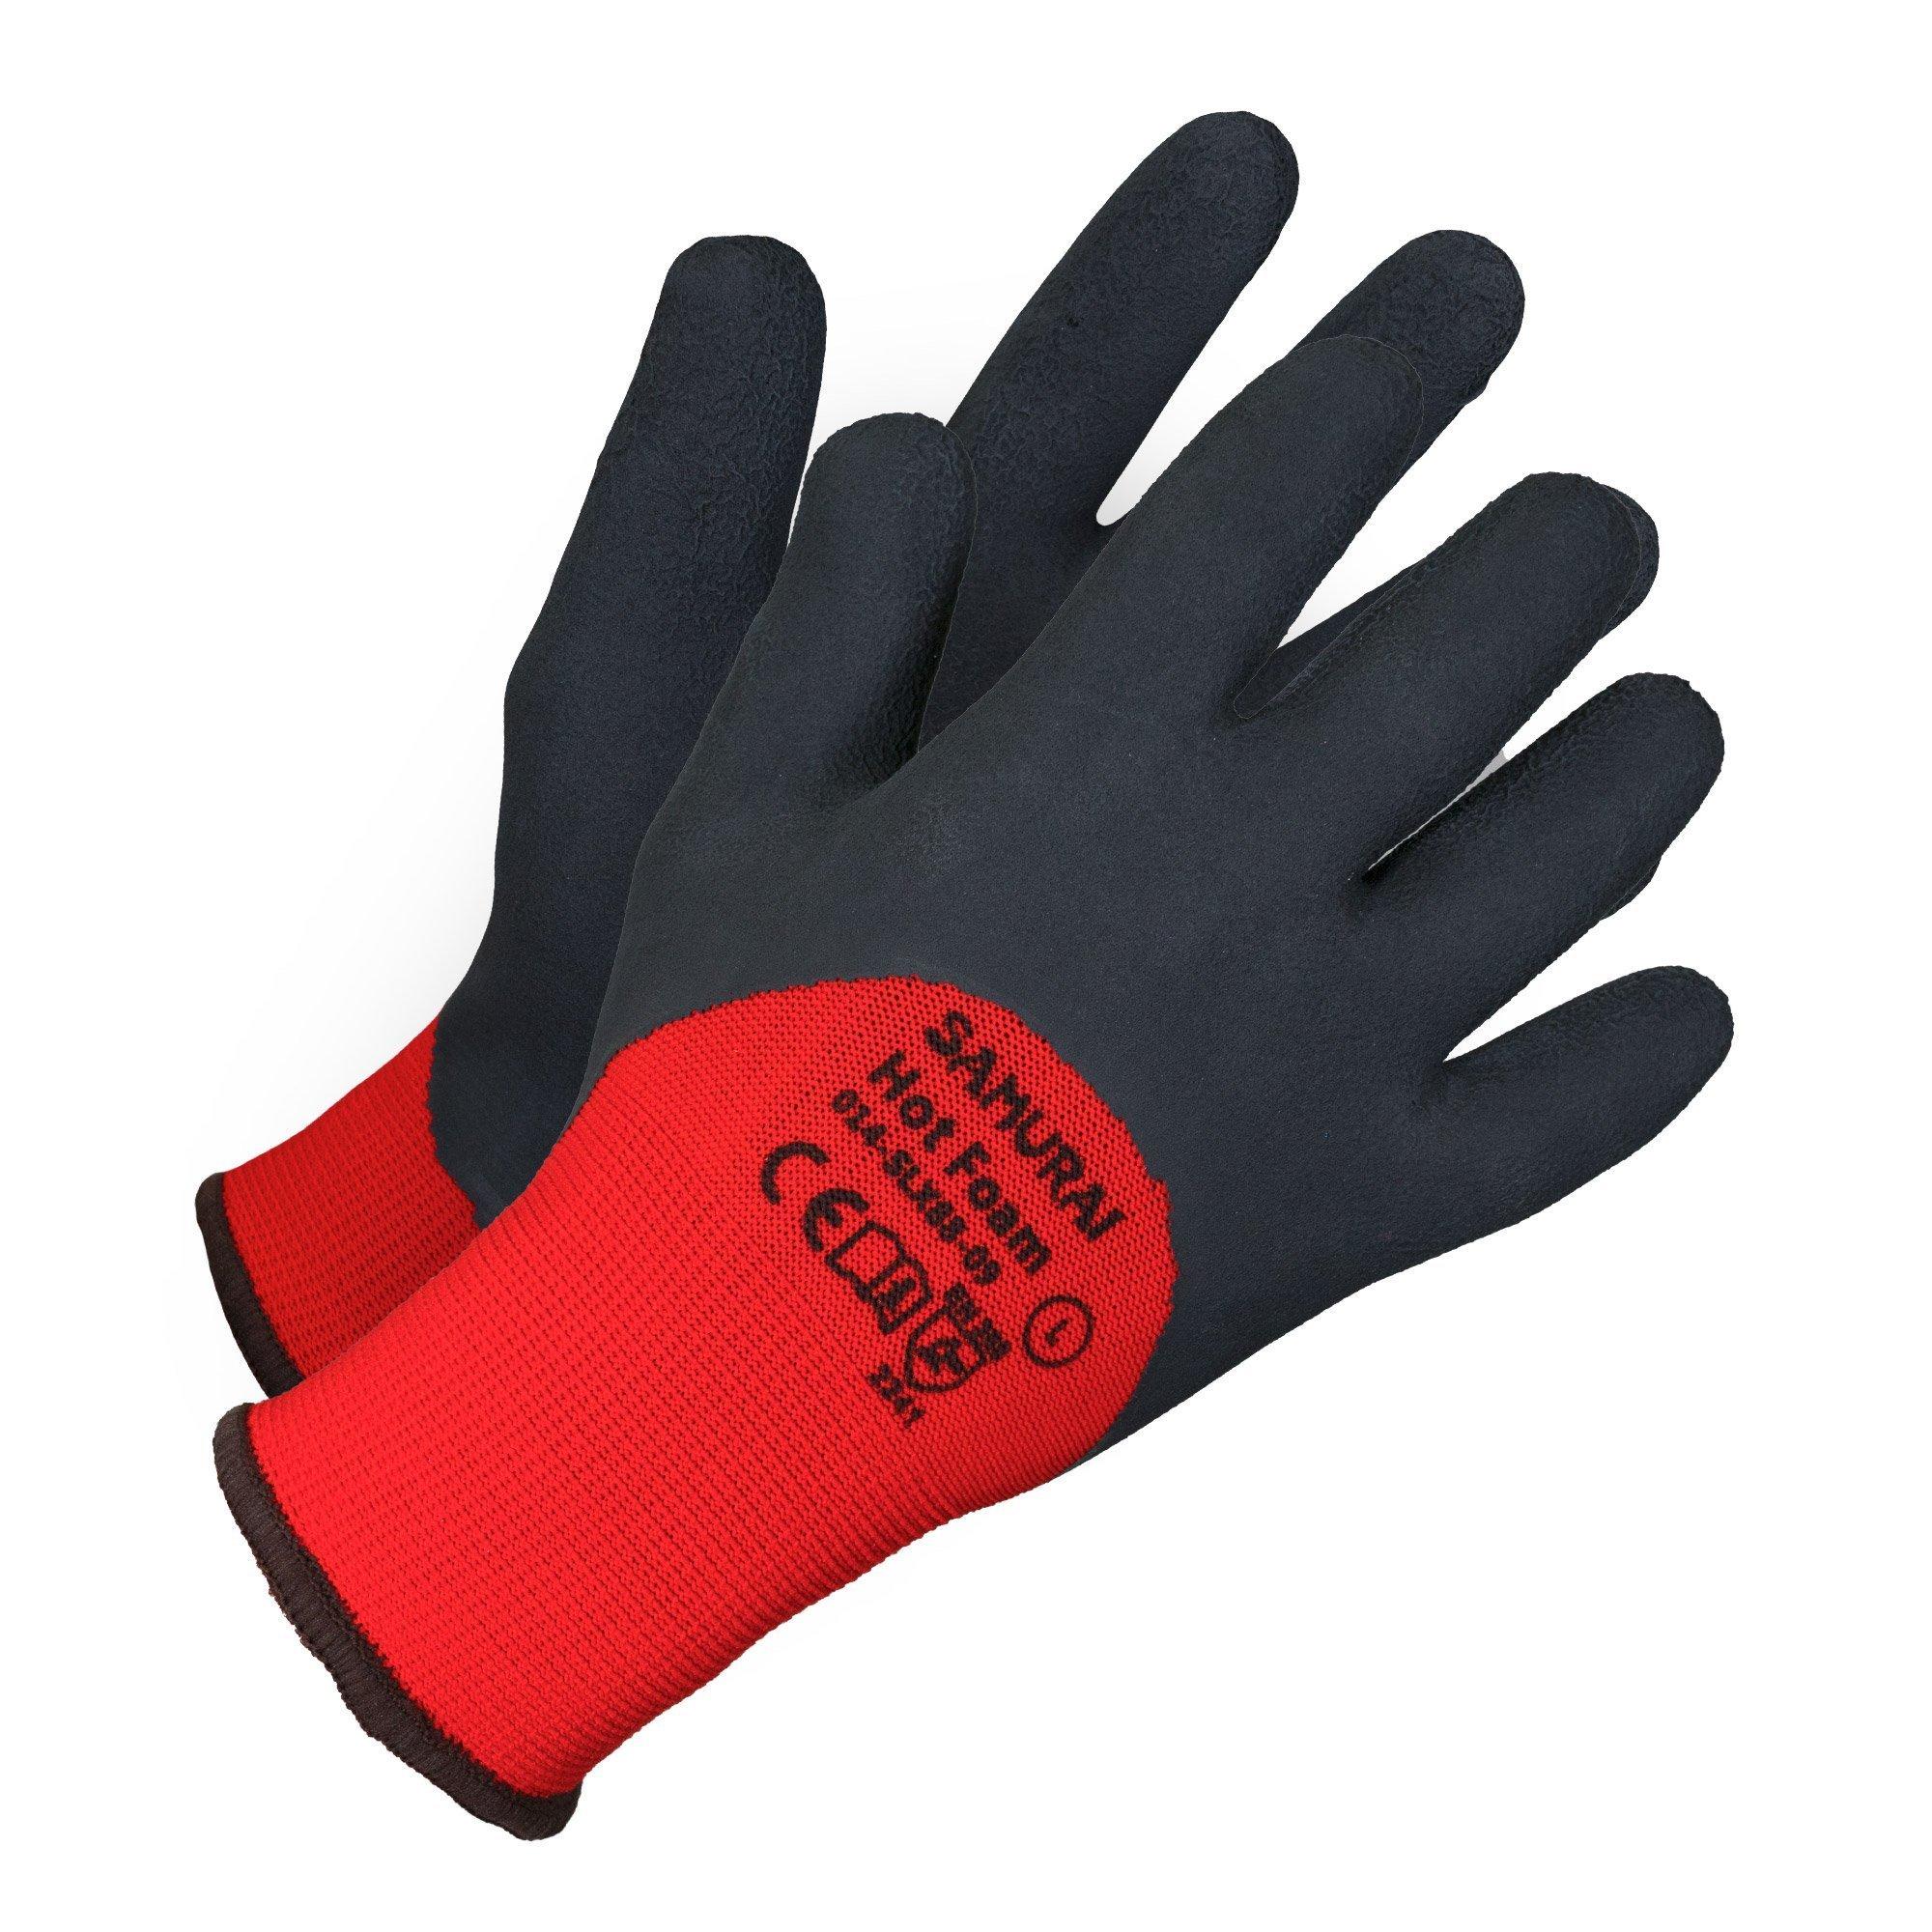 Gloves - Samurai Hot Foam High Dexterity Insulated Work Glove - Red - M